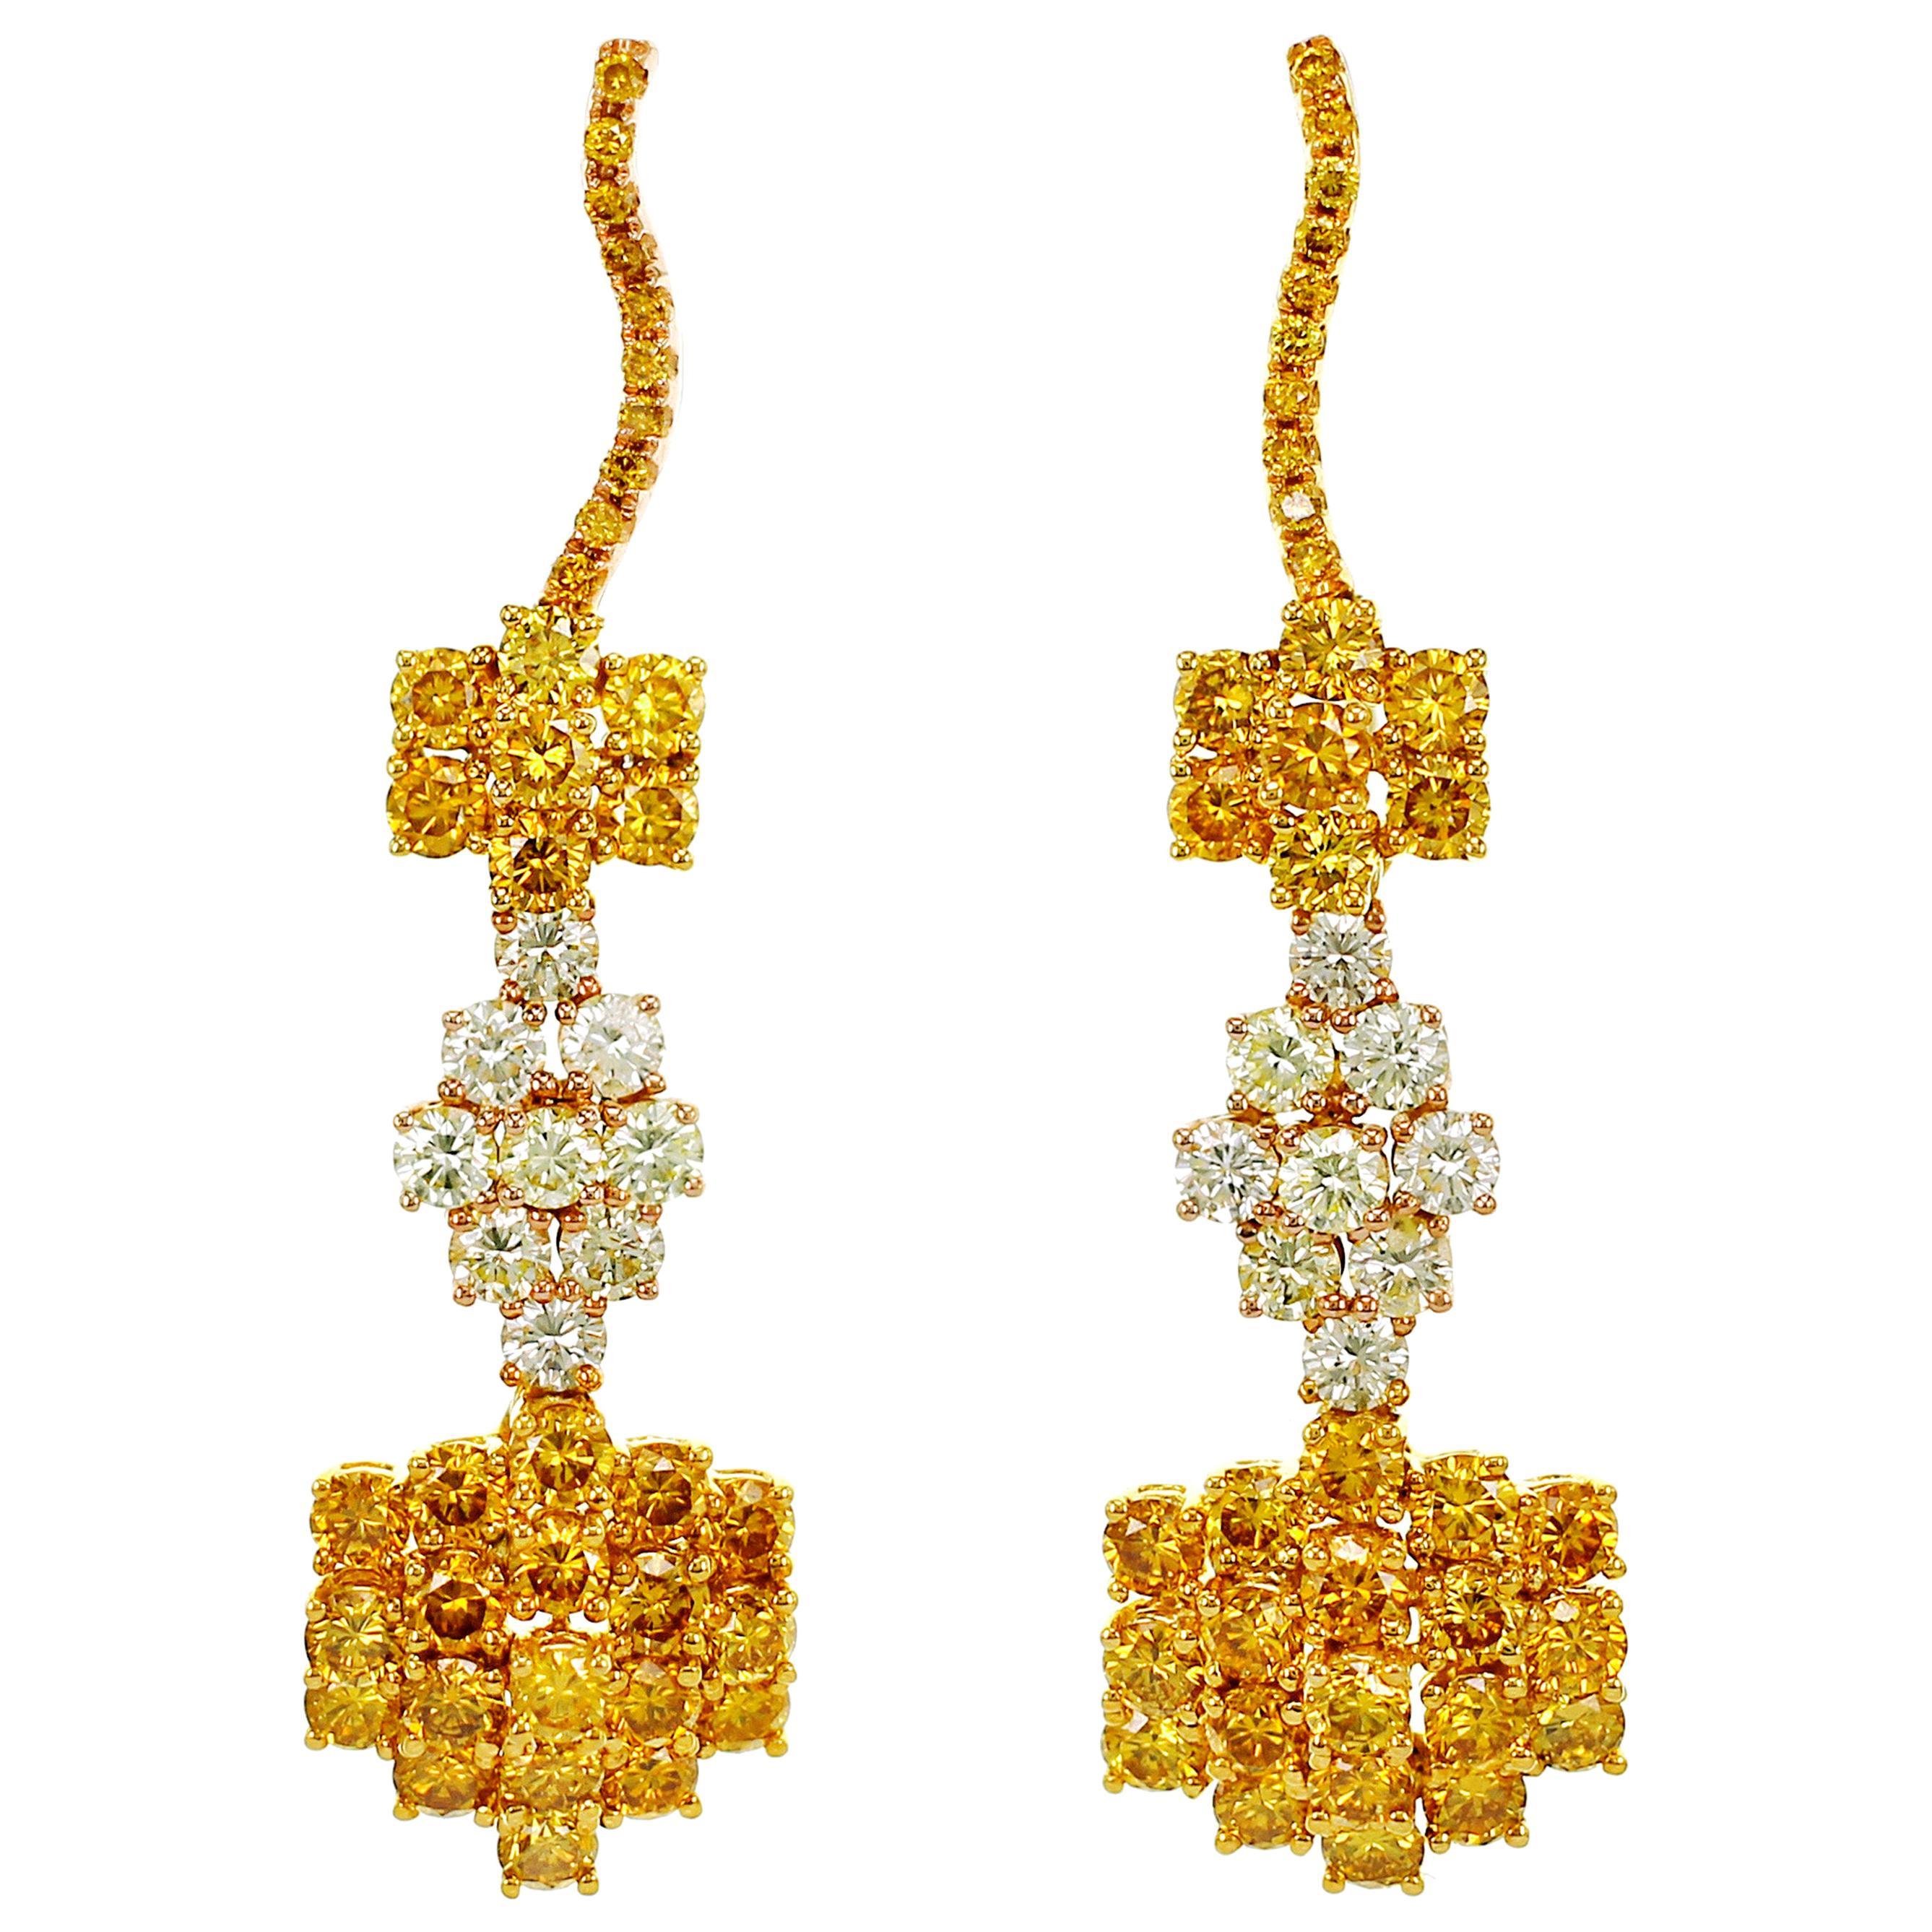 3.84 Carat Natural Fancy Color Diamond Dangle Earring